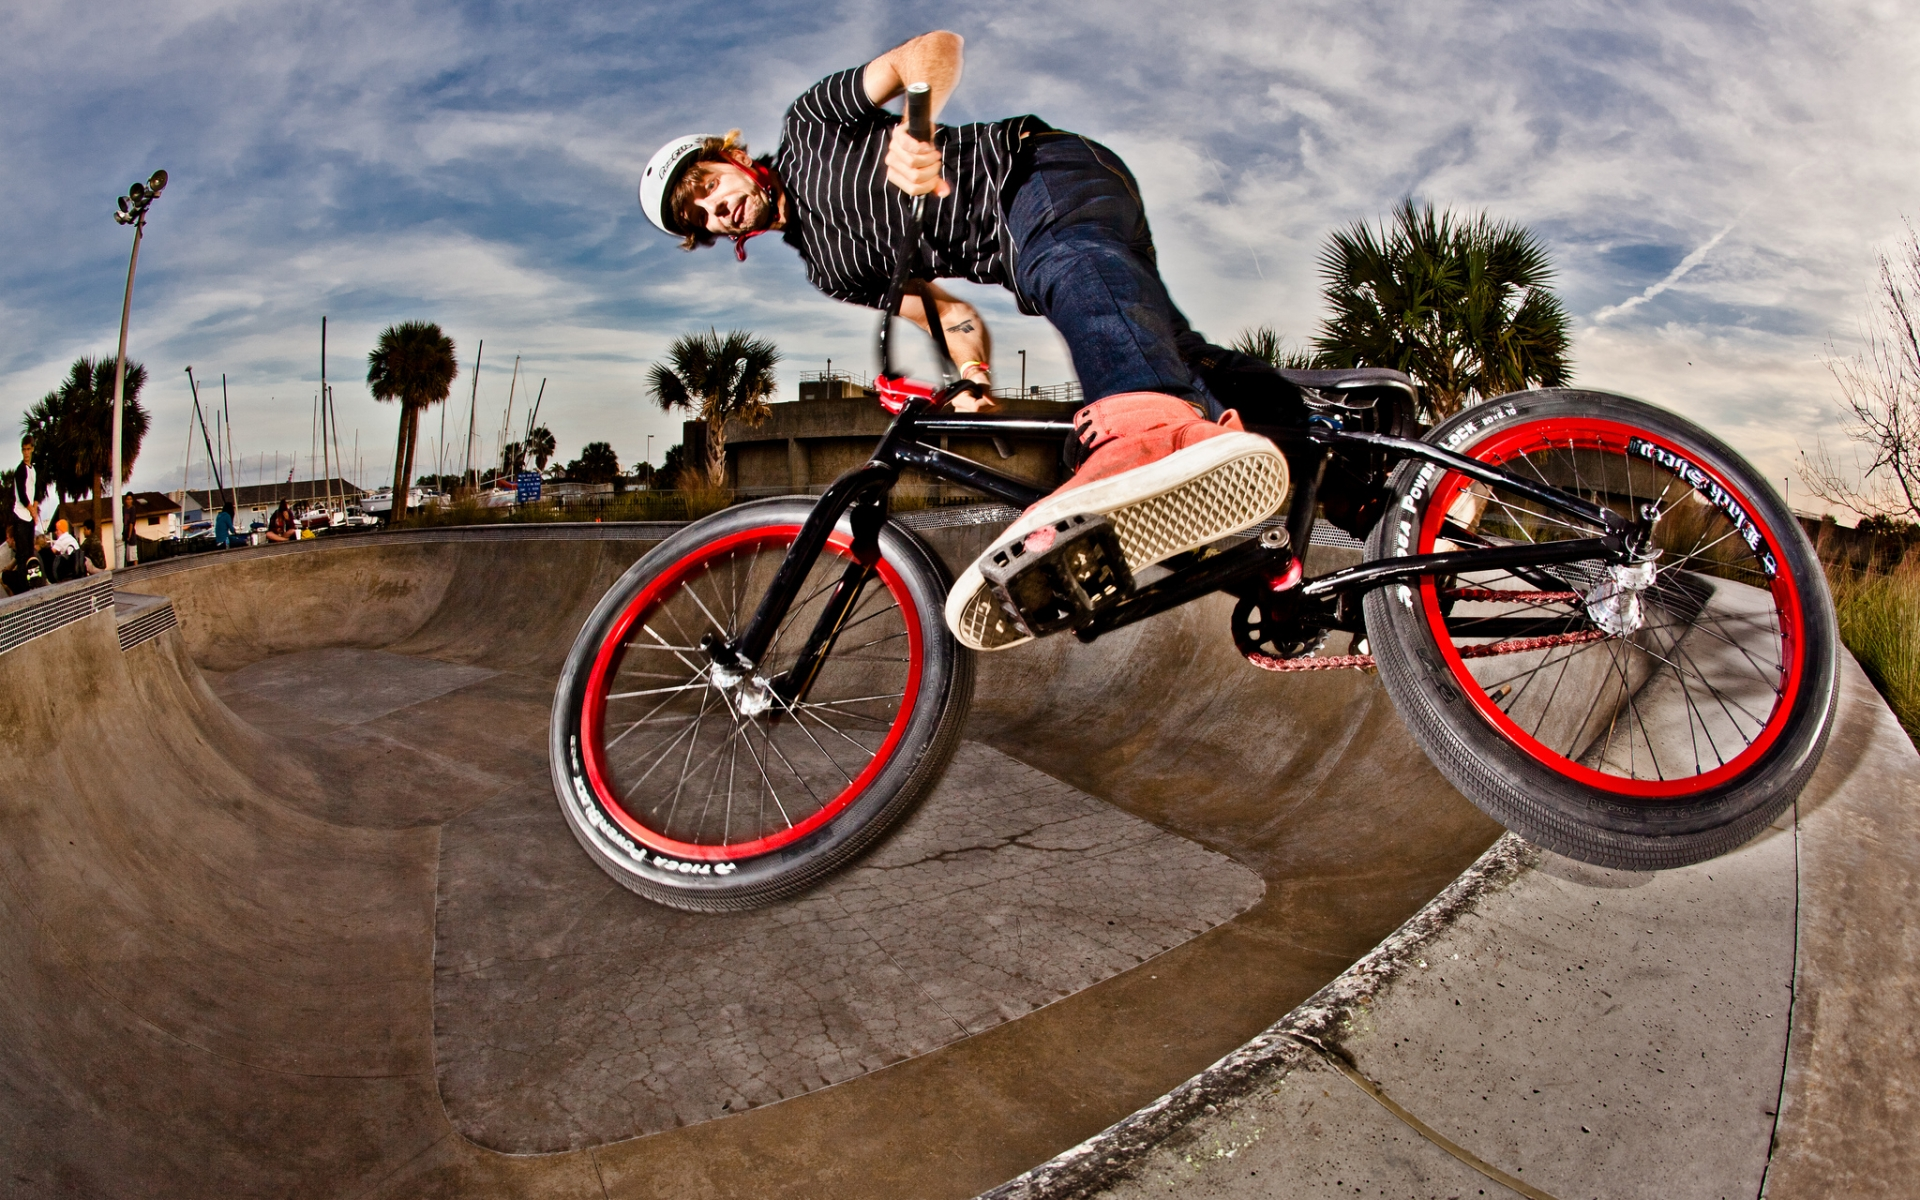 BMX en un Skatepark - 1920x1200